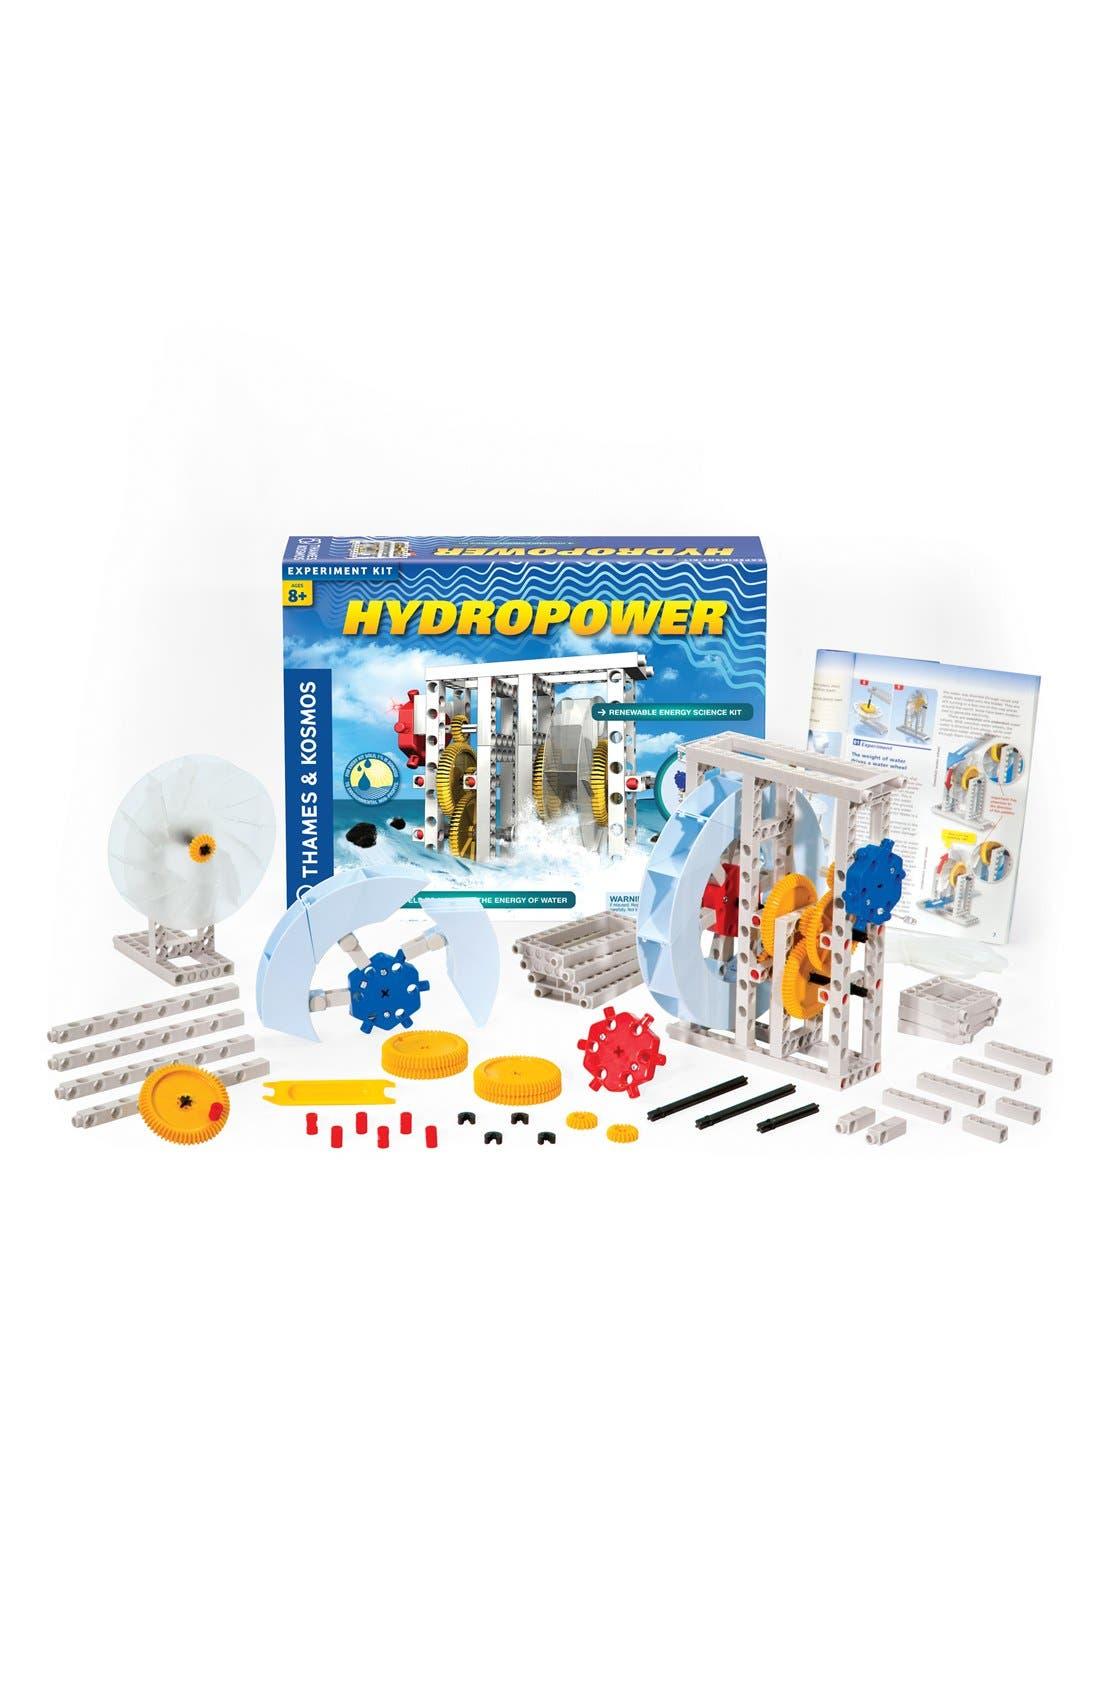 'Hydropower' Experiment Kit,                             Main thumbnail 1, color,